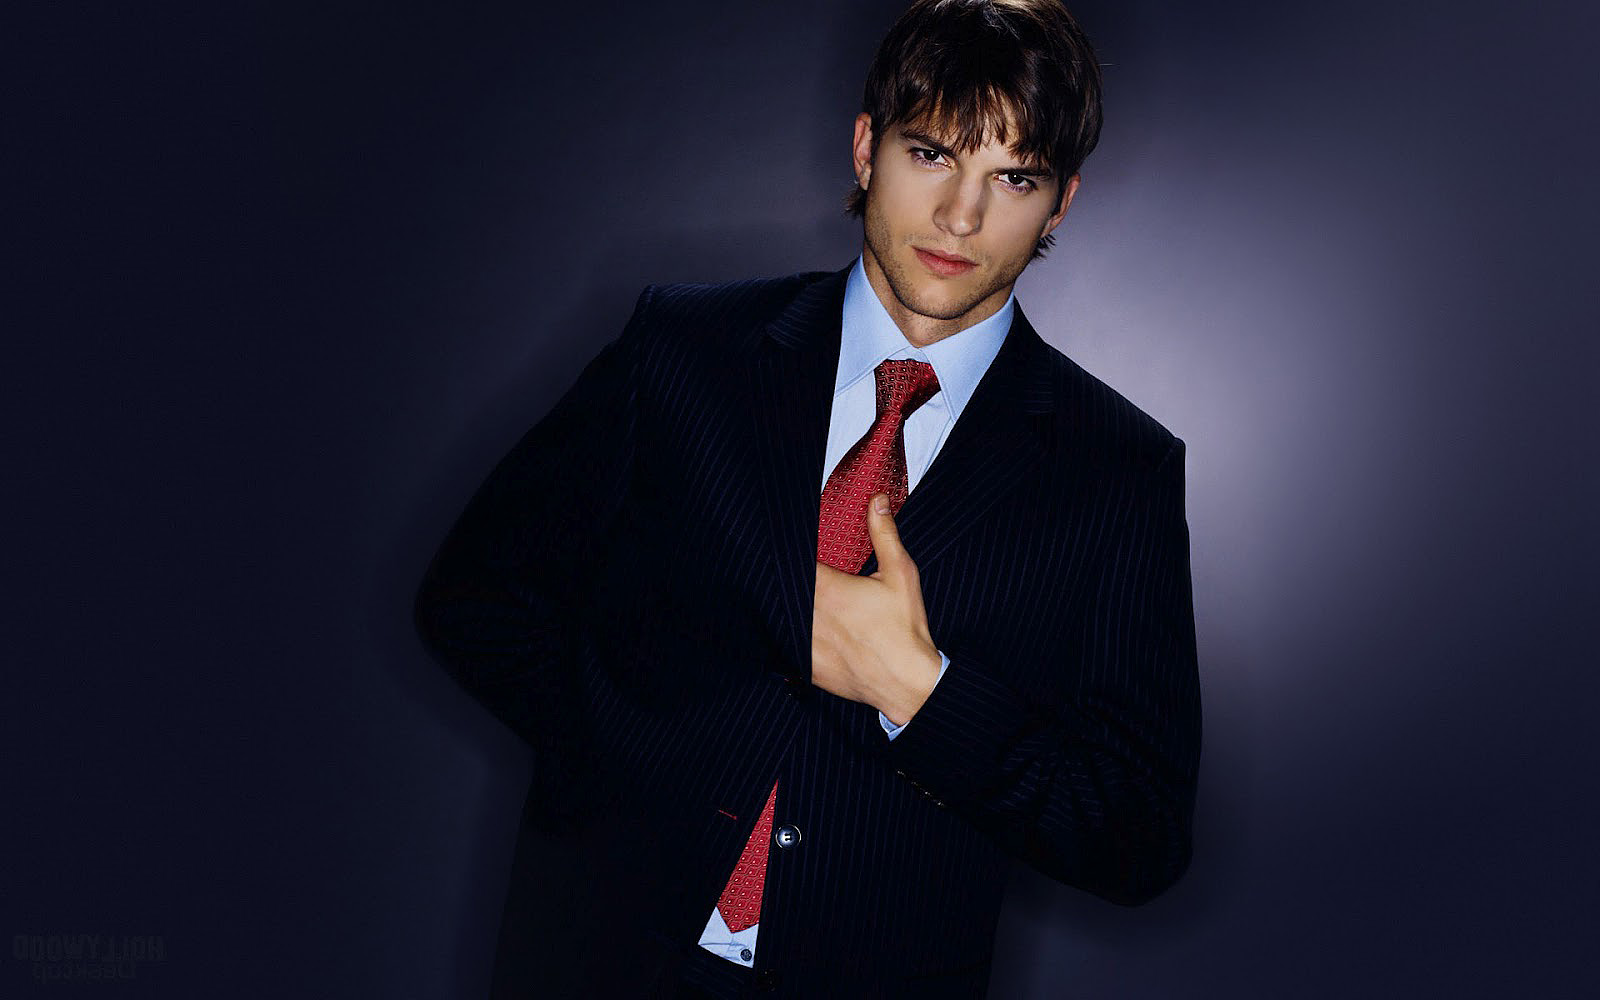 Ashton Kutcher As A Child HD Wallpaper Background Images 1600x1000